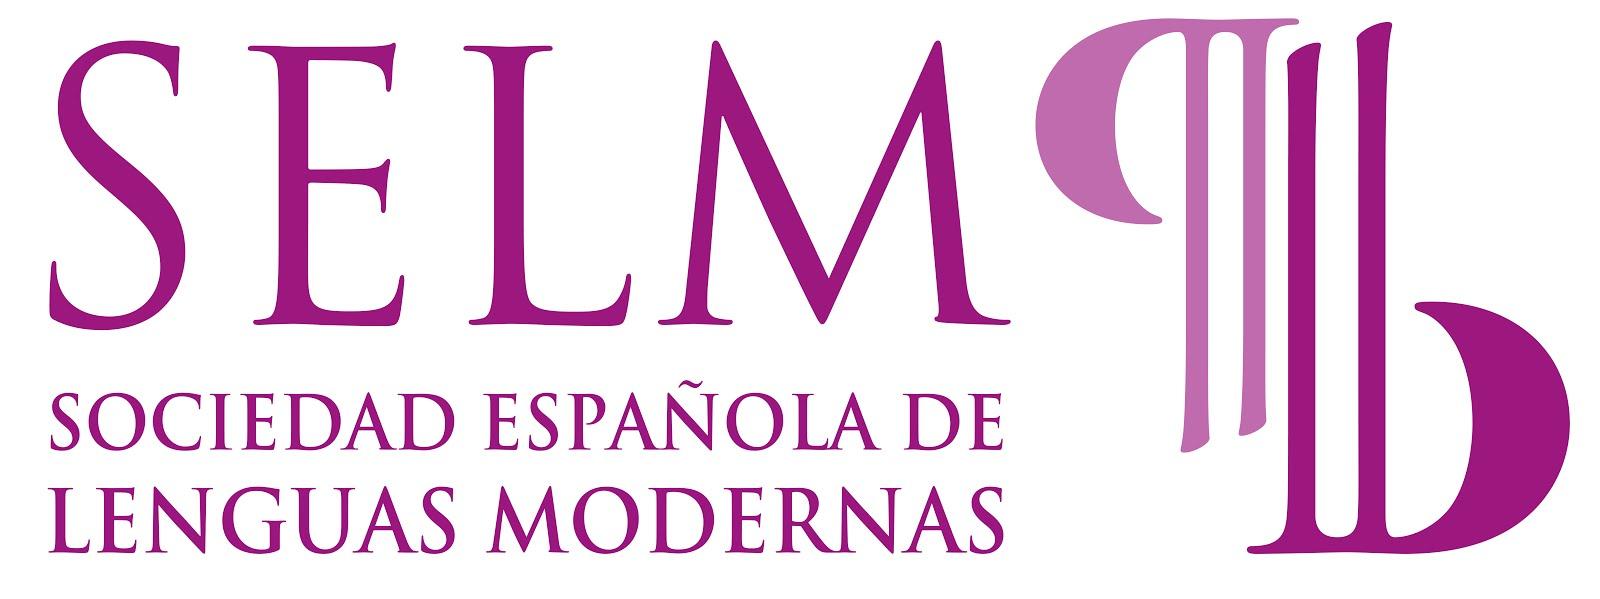 Socia profesional de la Sociedad Española de Lenguas Modernas